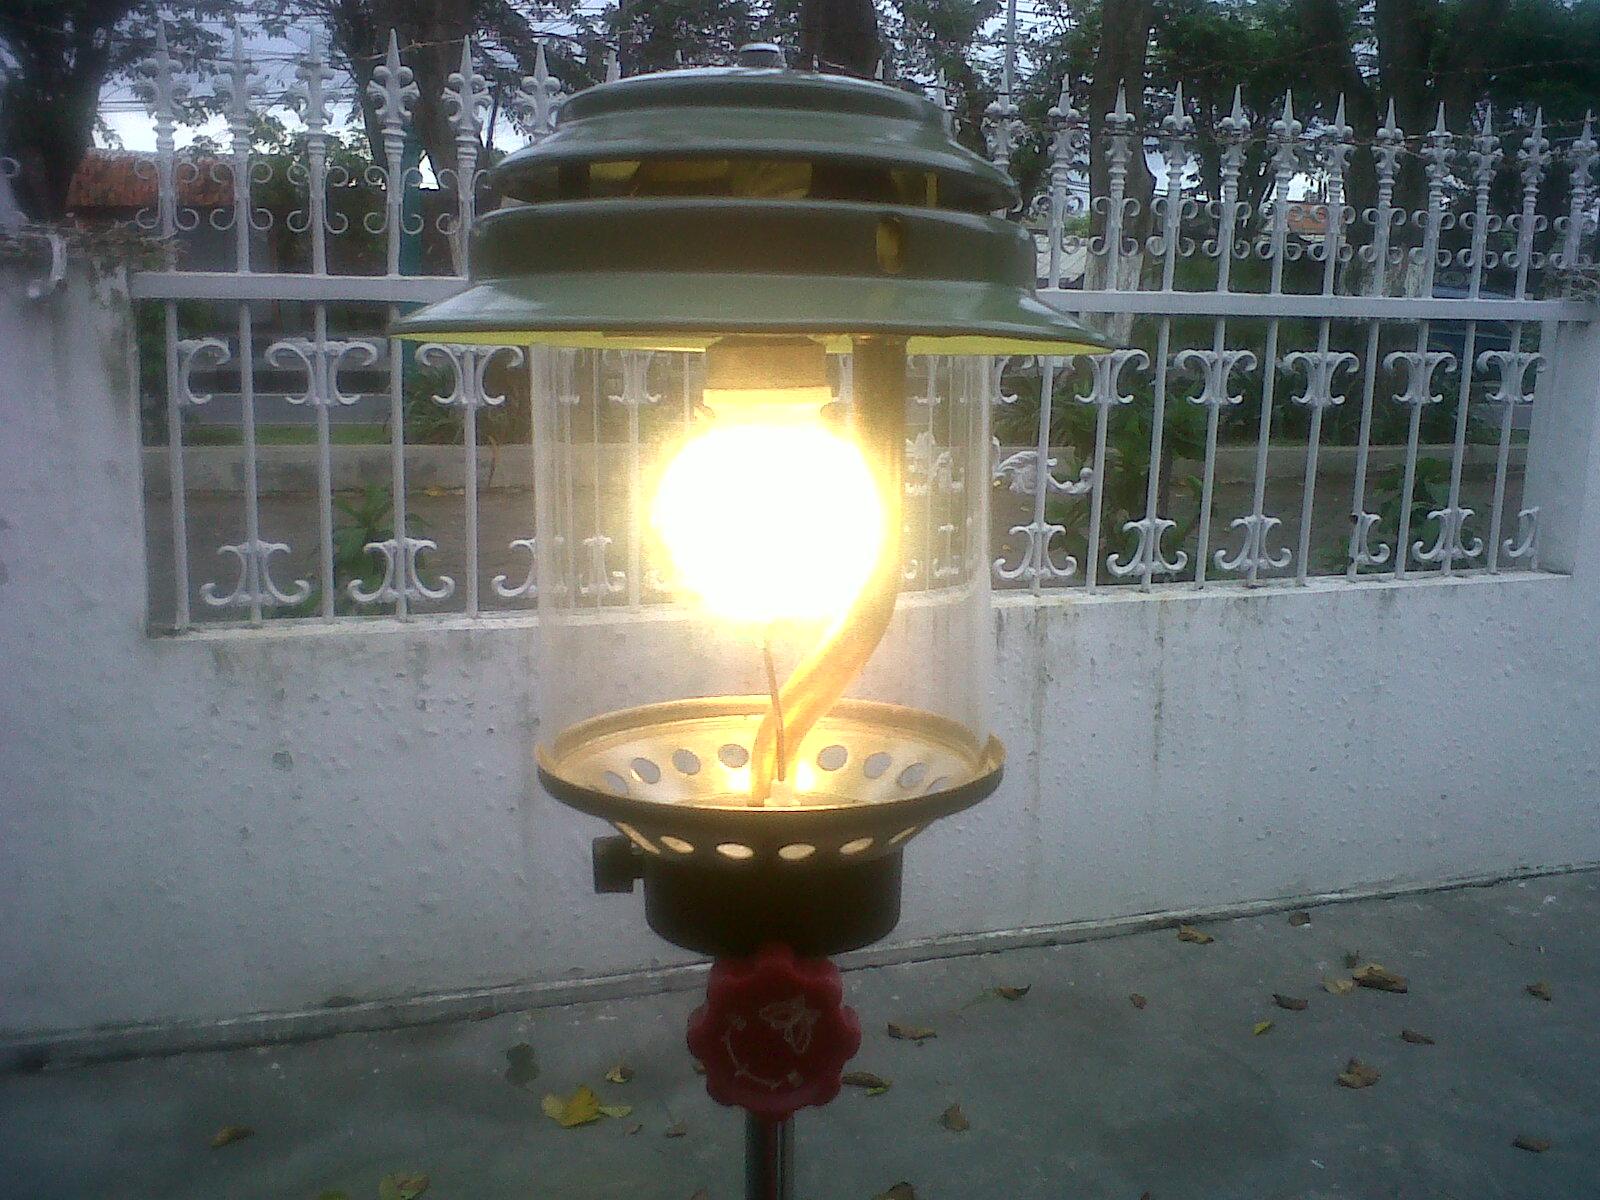 Cara Bikin Lampion Dari Sendok Plastik Yang Cantik Dan Mudah | Search ...